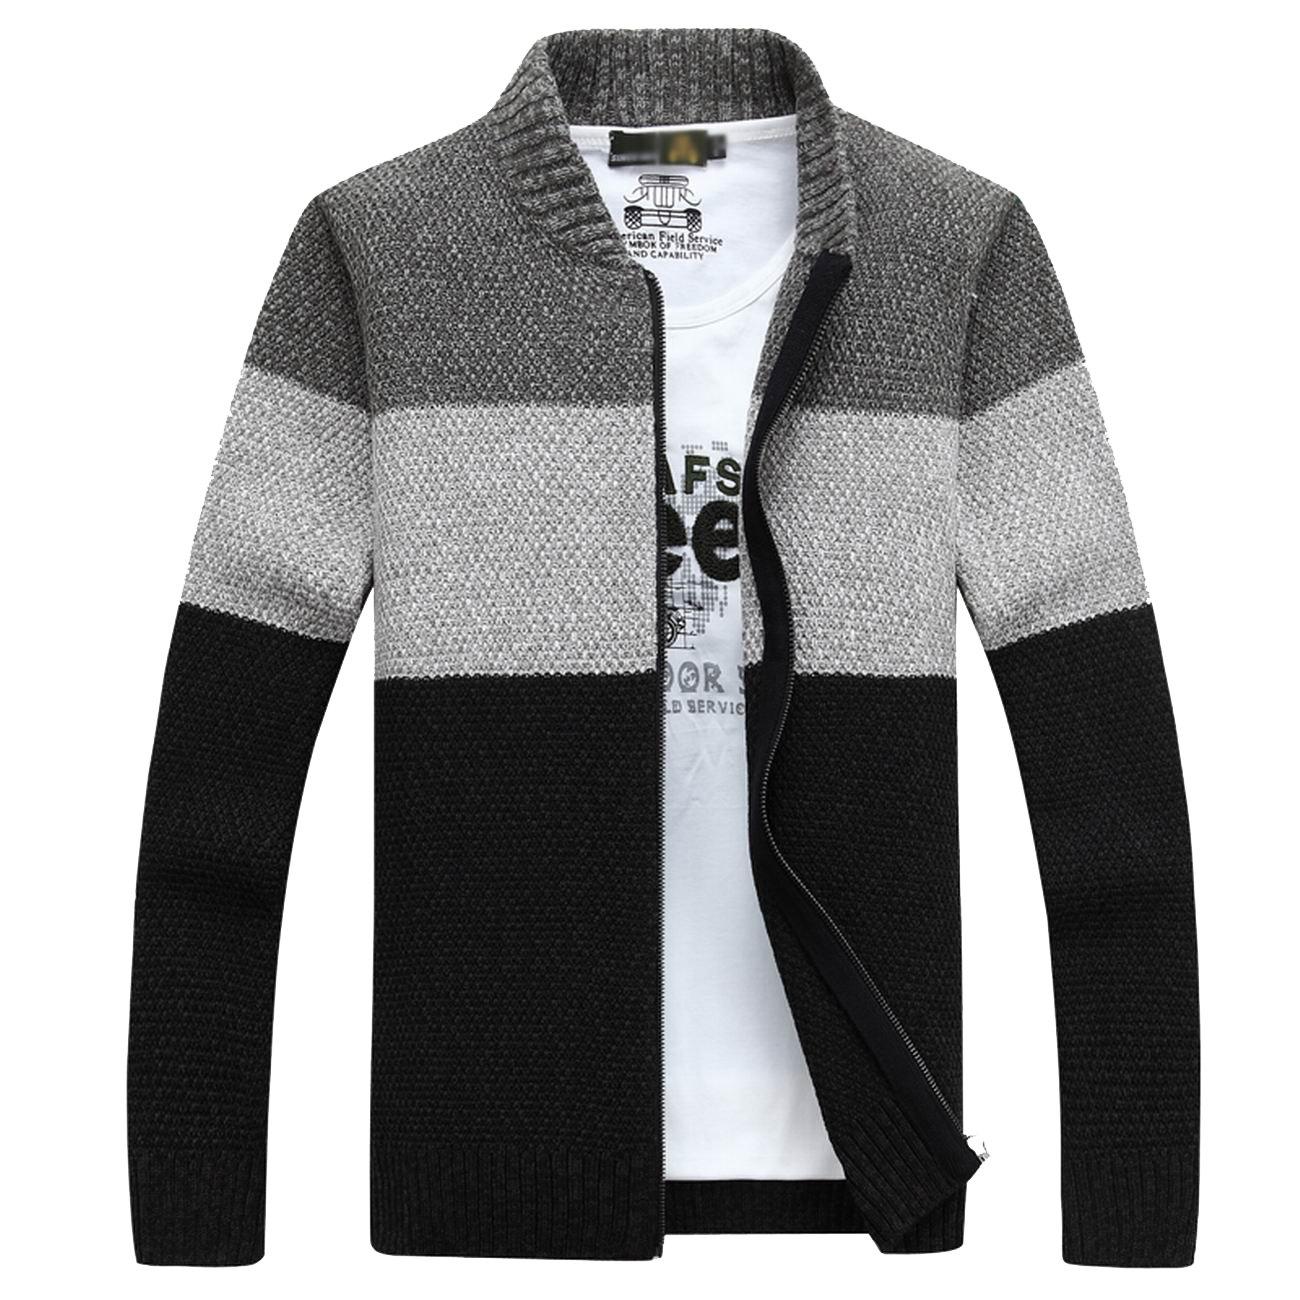 Fanhang Men's Knitted Zip Down Cardigan Sweater With Stripe (XXL, DARK GRAY)